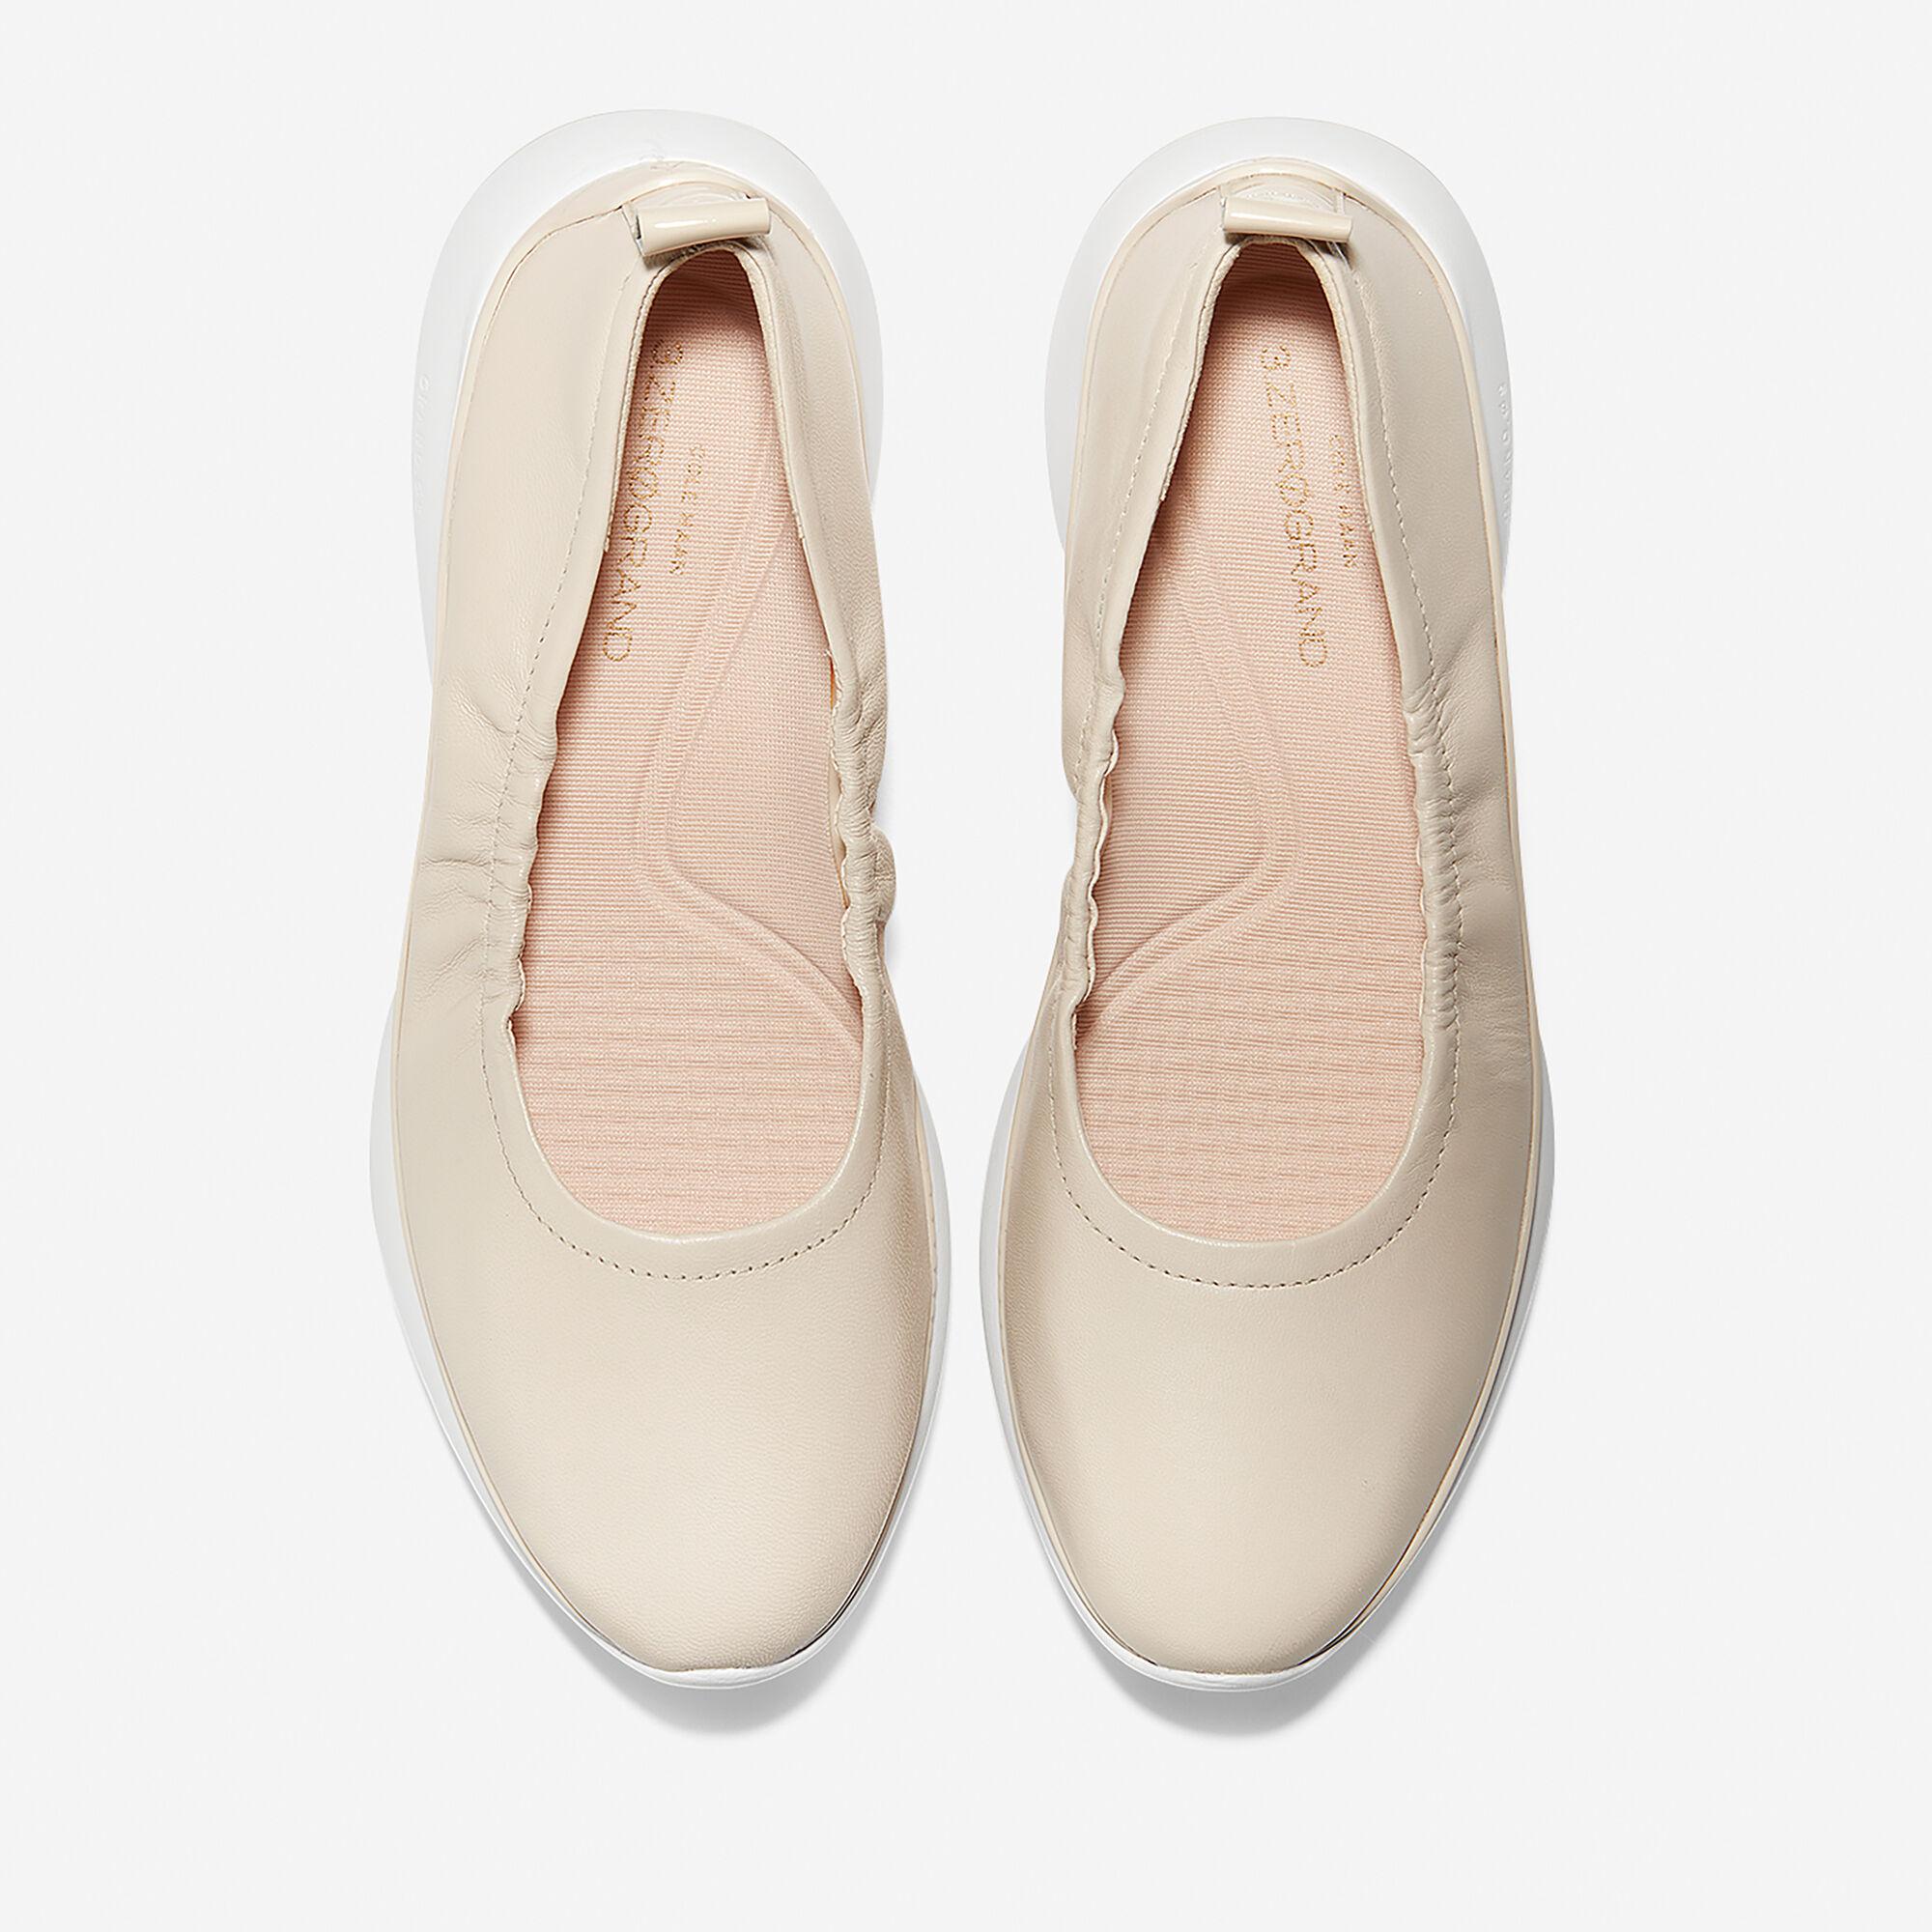 6fa1e93b1 ZERØGRAND Ruched Slip-On Ballet Flat; Women's 3.ZERØGRAND Ruched Slip-On  Ballet ...